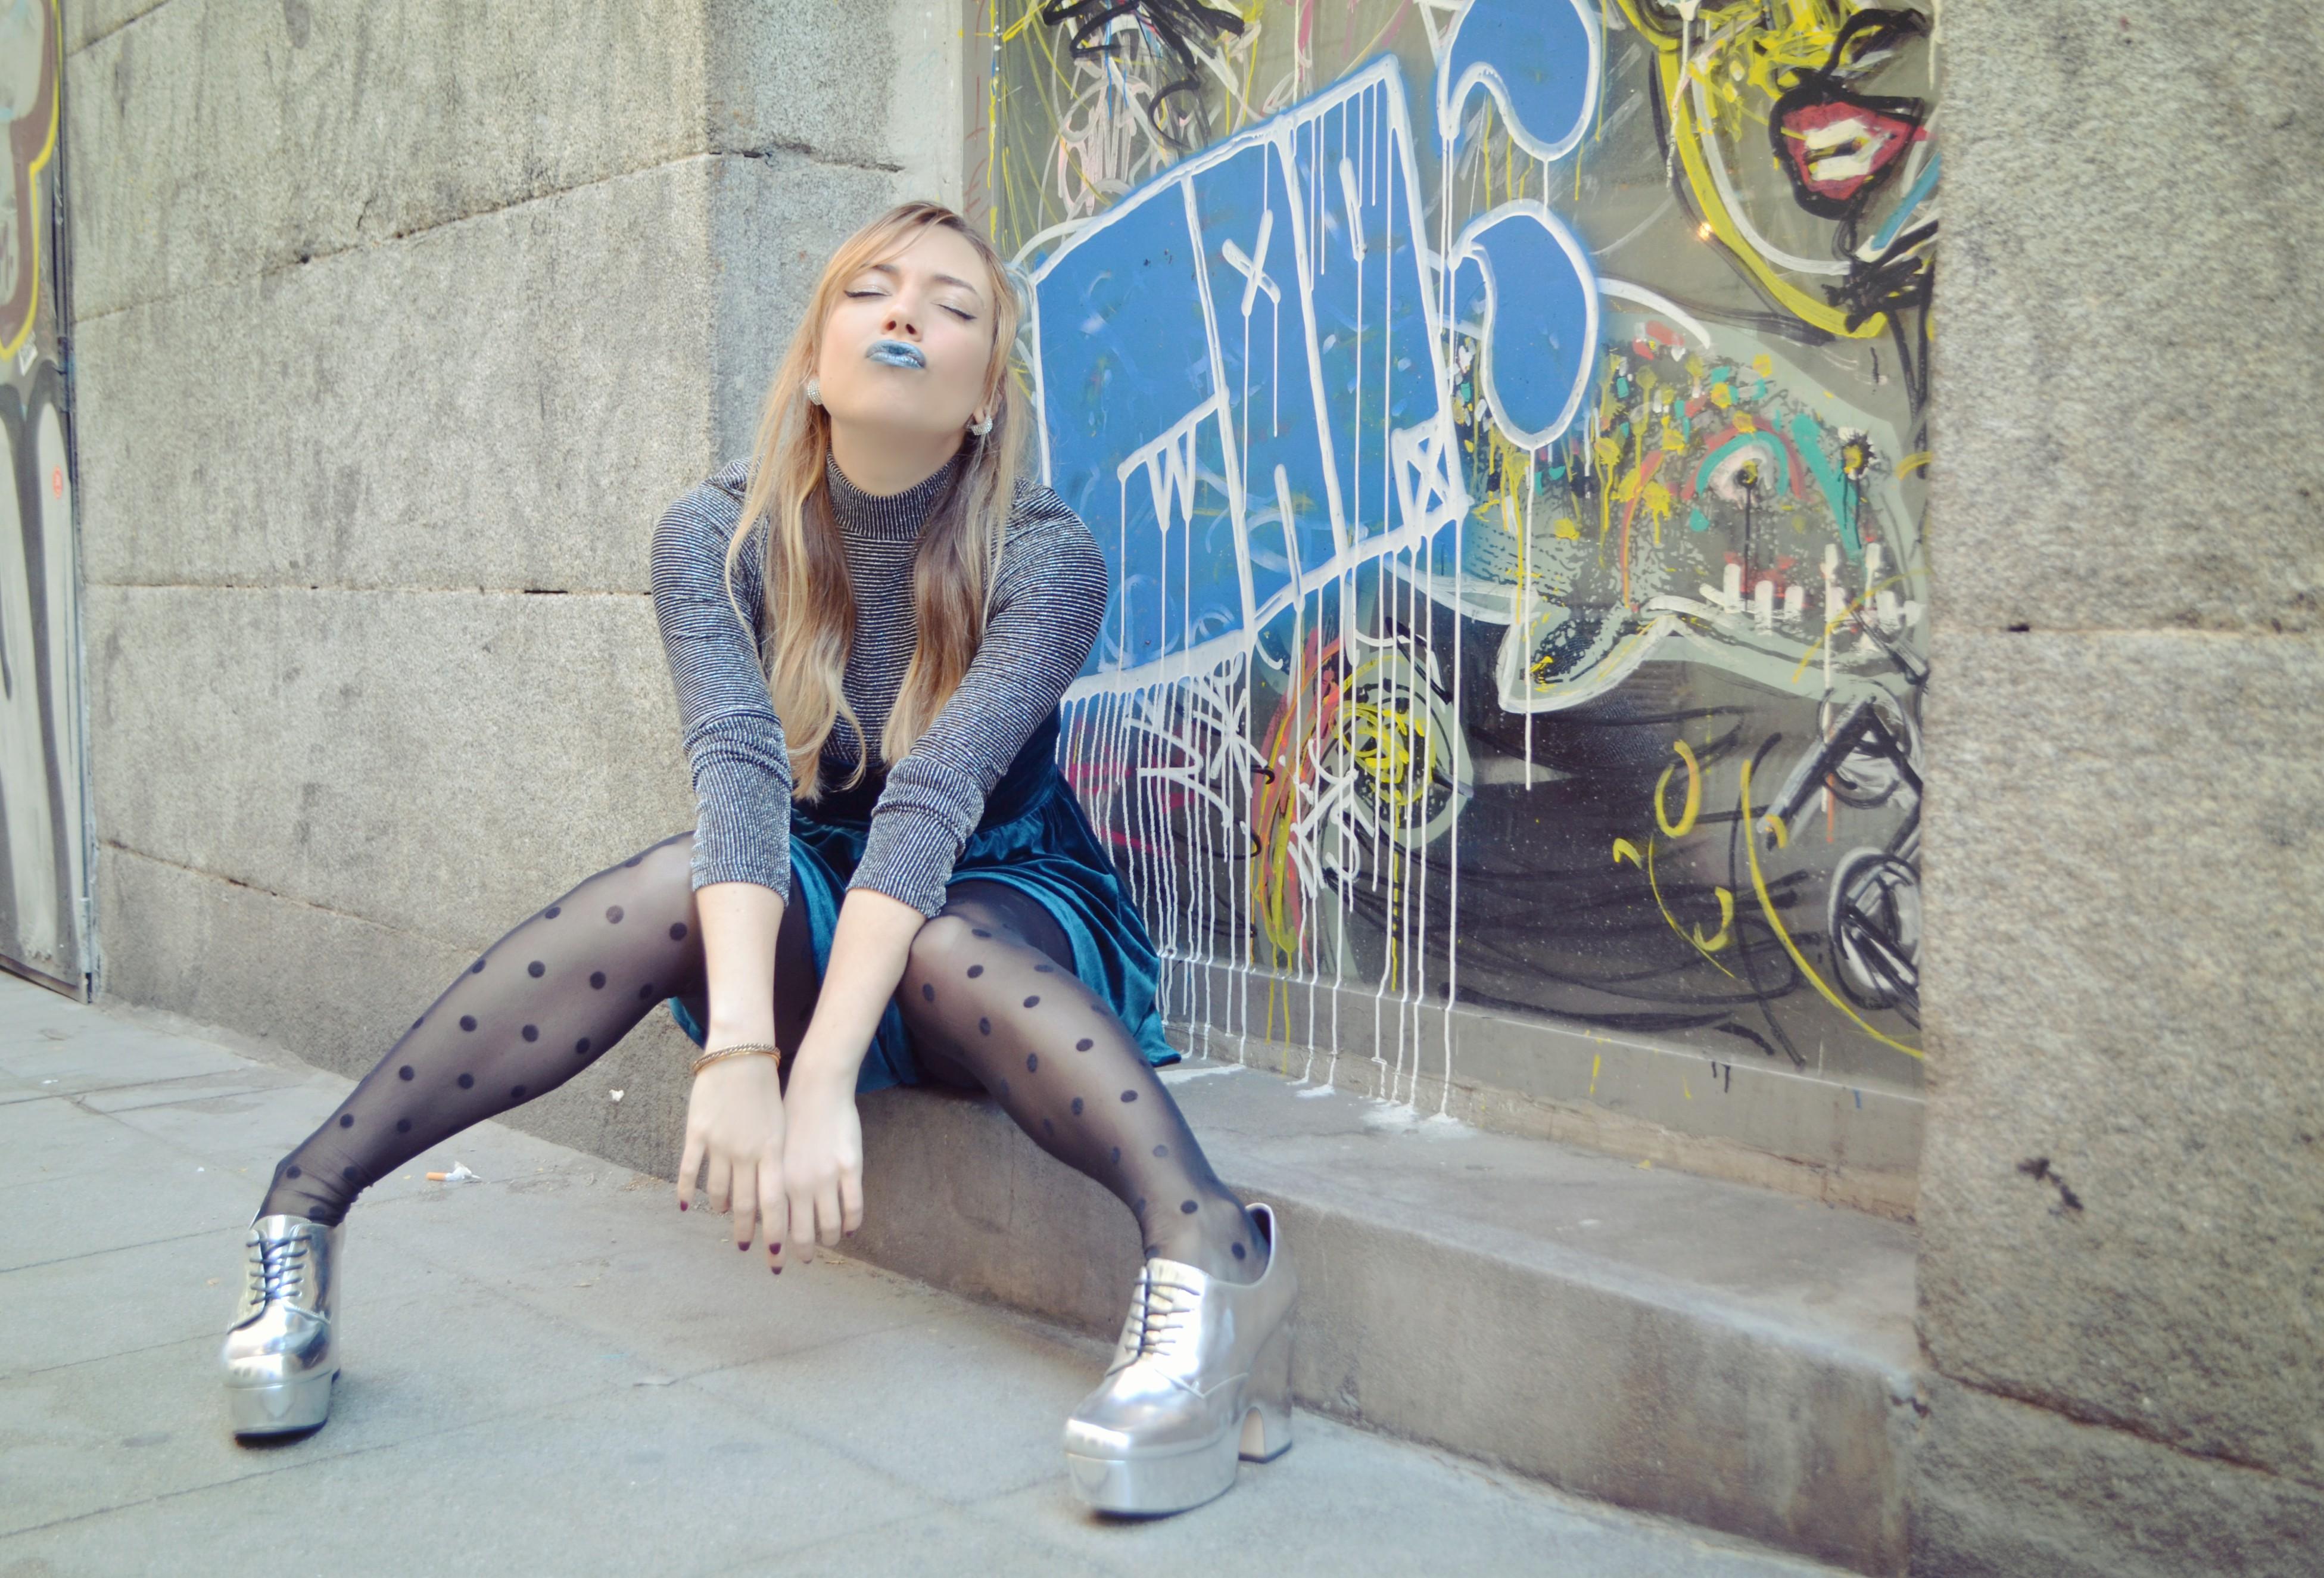 ChicAdicta-fashionista-blog-de-moda-influencer-Madrid-Chic-Adicta-labial-azul-nyx-romwe-jumpsuit-velvet-PiensaenChic-Piensa-en-Chic